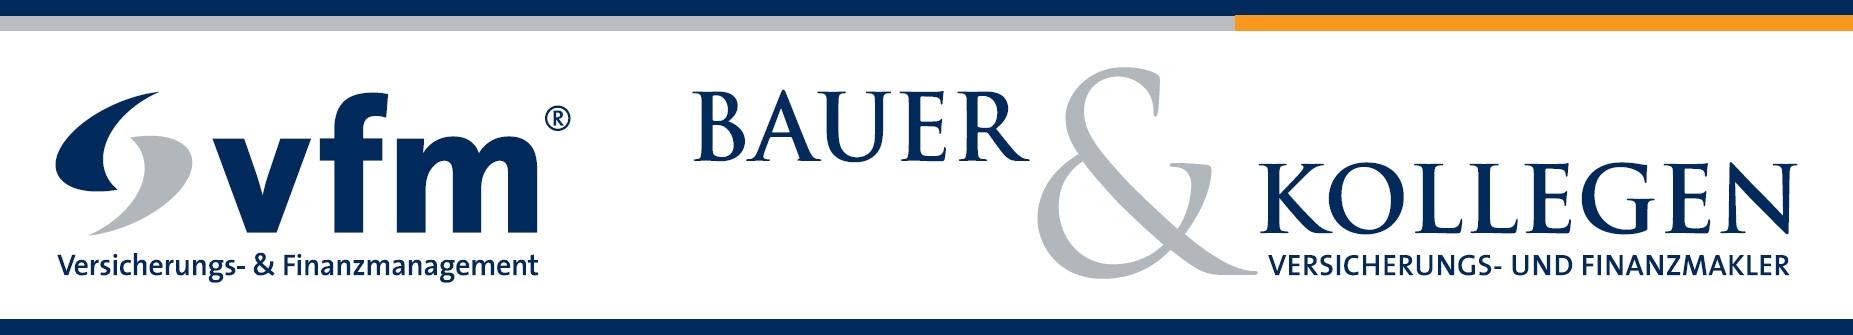 Bauer & Kollegen